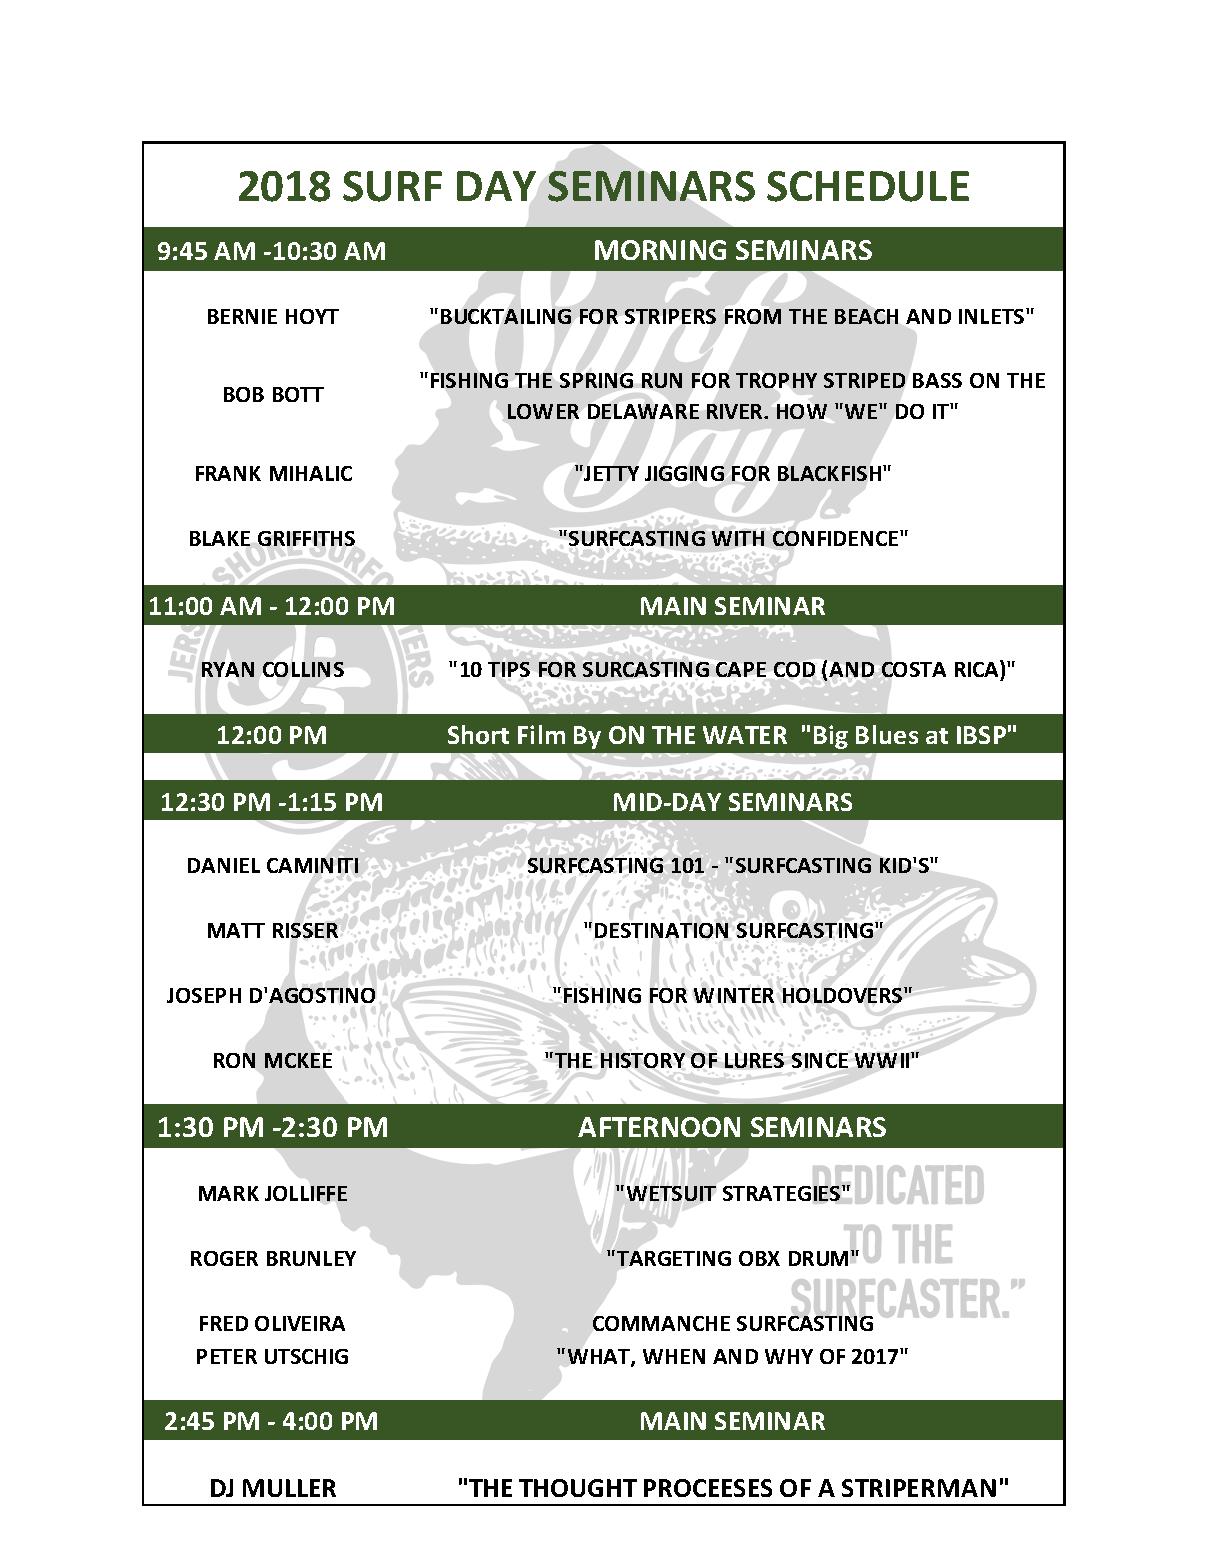 Seminar-schedule-2018..png.e94833dea688535d4a7053aa90033aee.png